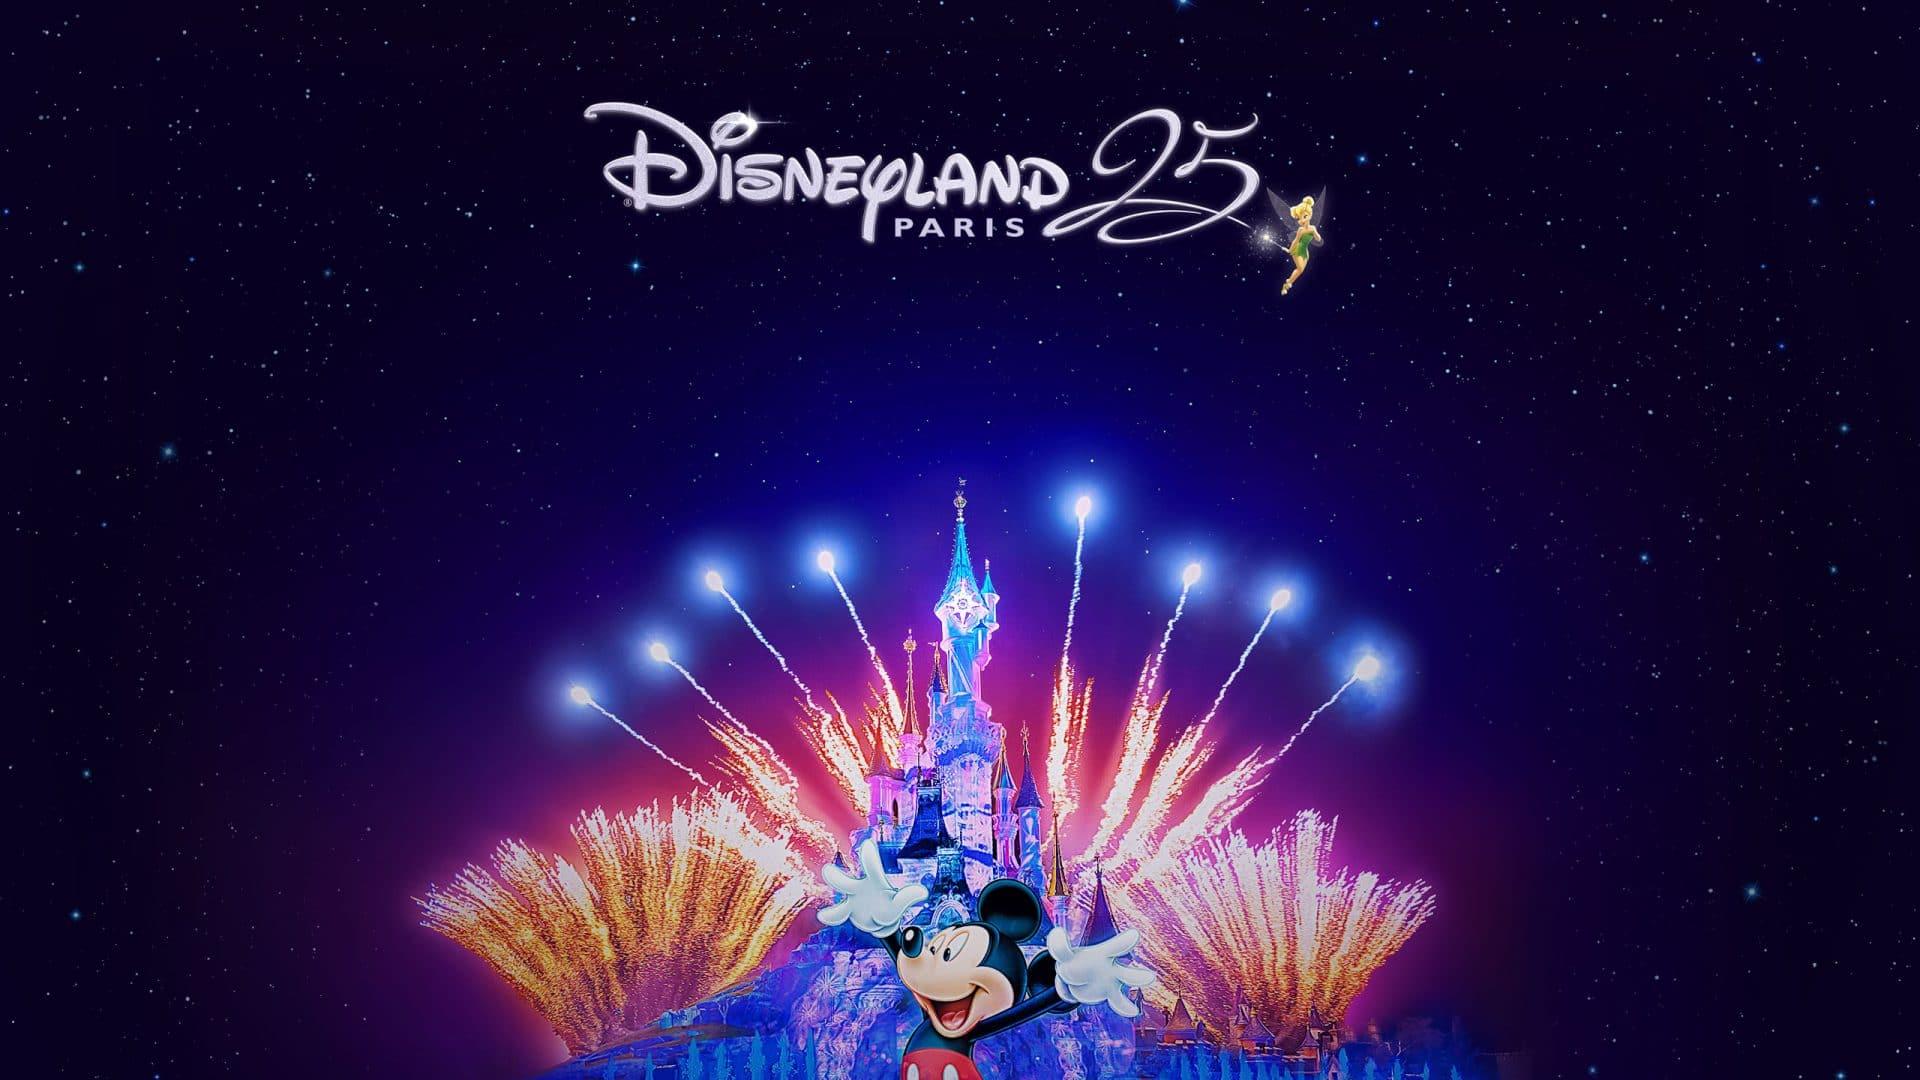 25 ième anniversaire en 2017 de Disneyland Paris